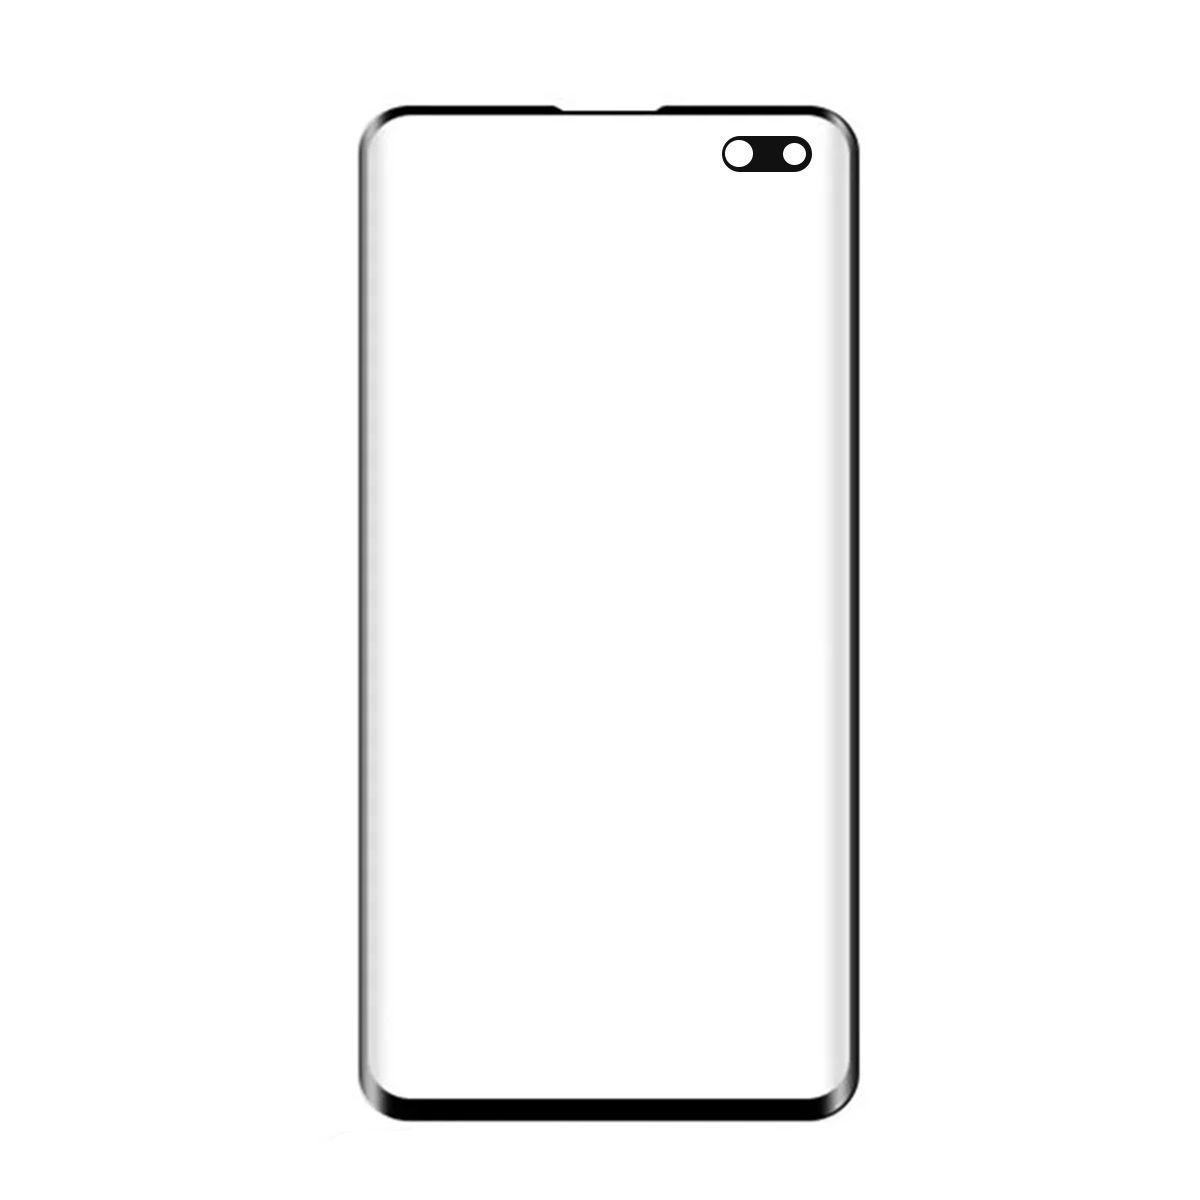 Стекло Samsung Galaxy S10 Plus G975F, Black